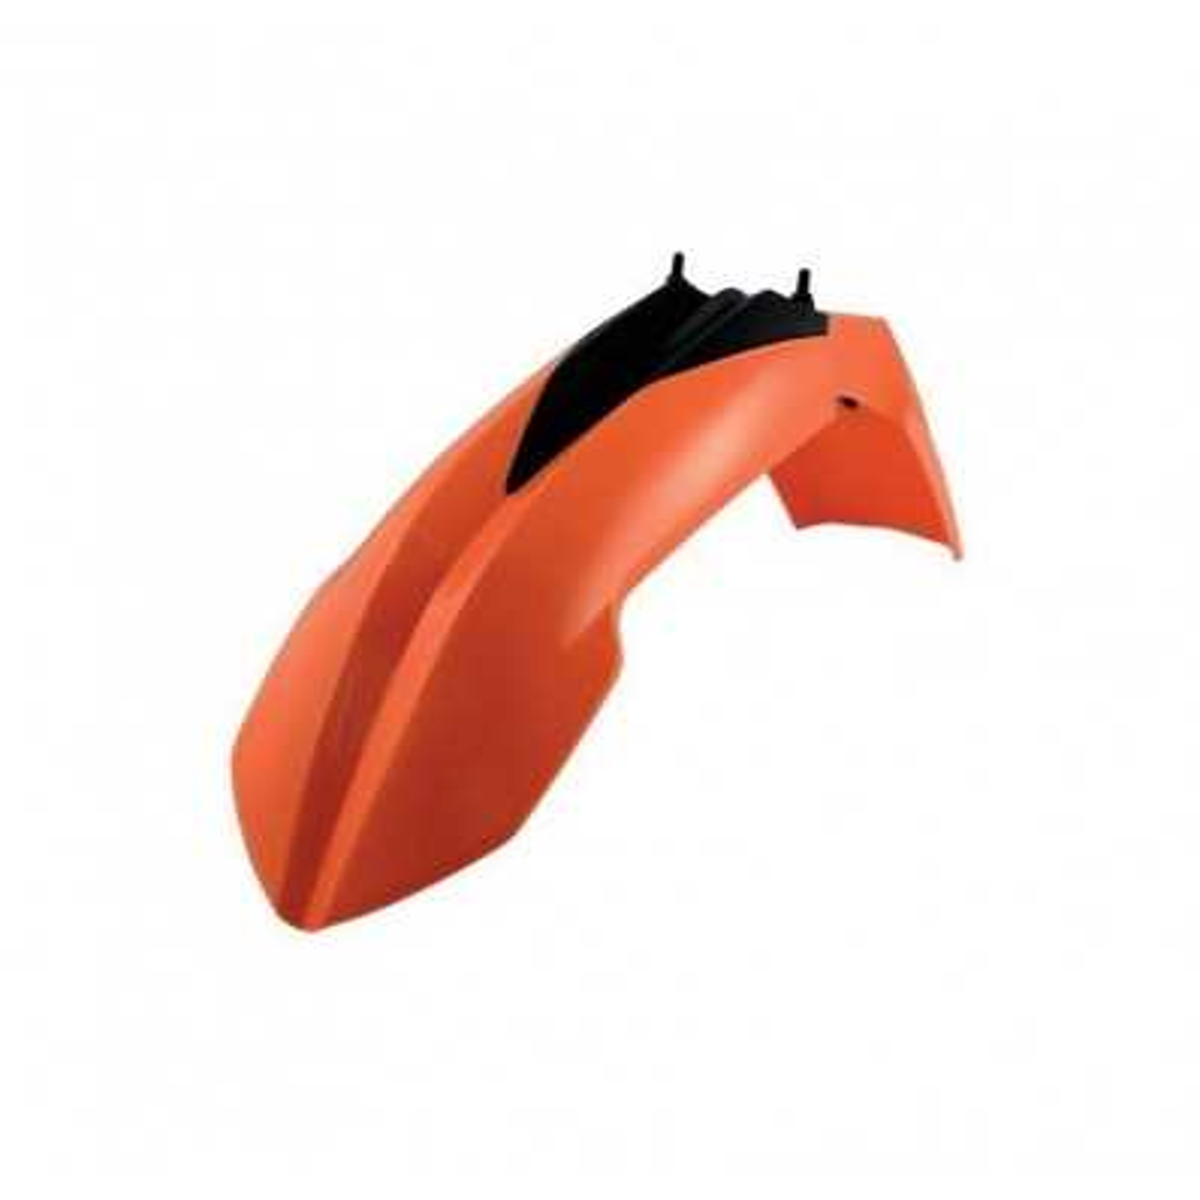 0016869-011 - Guardabarros Delantero Ktm 13 15 Naranja Negro